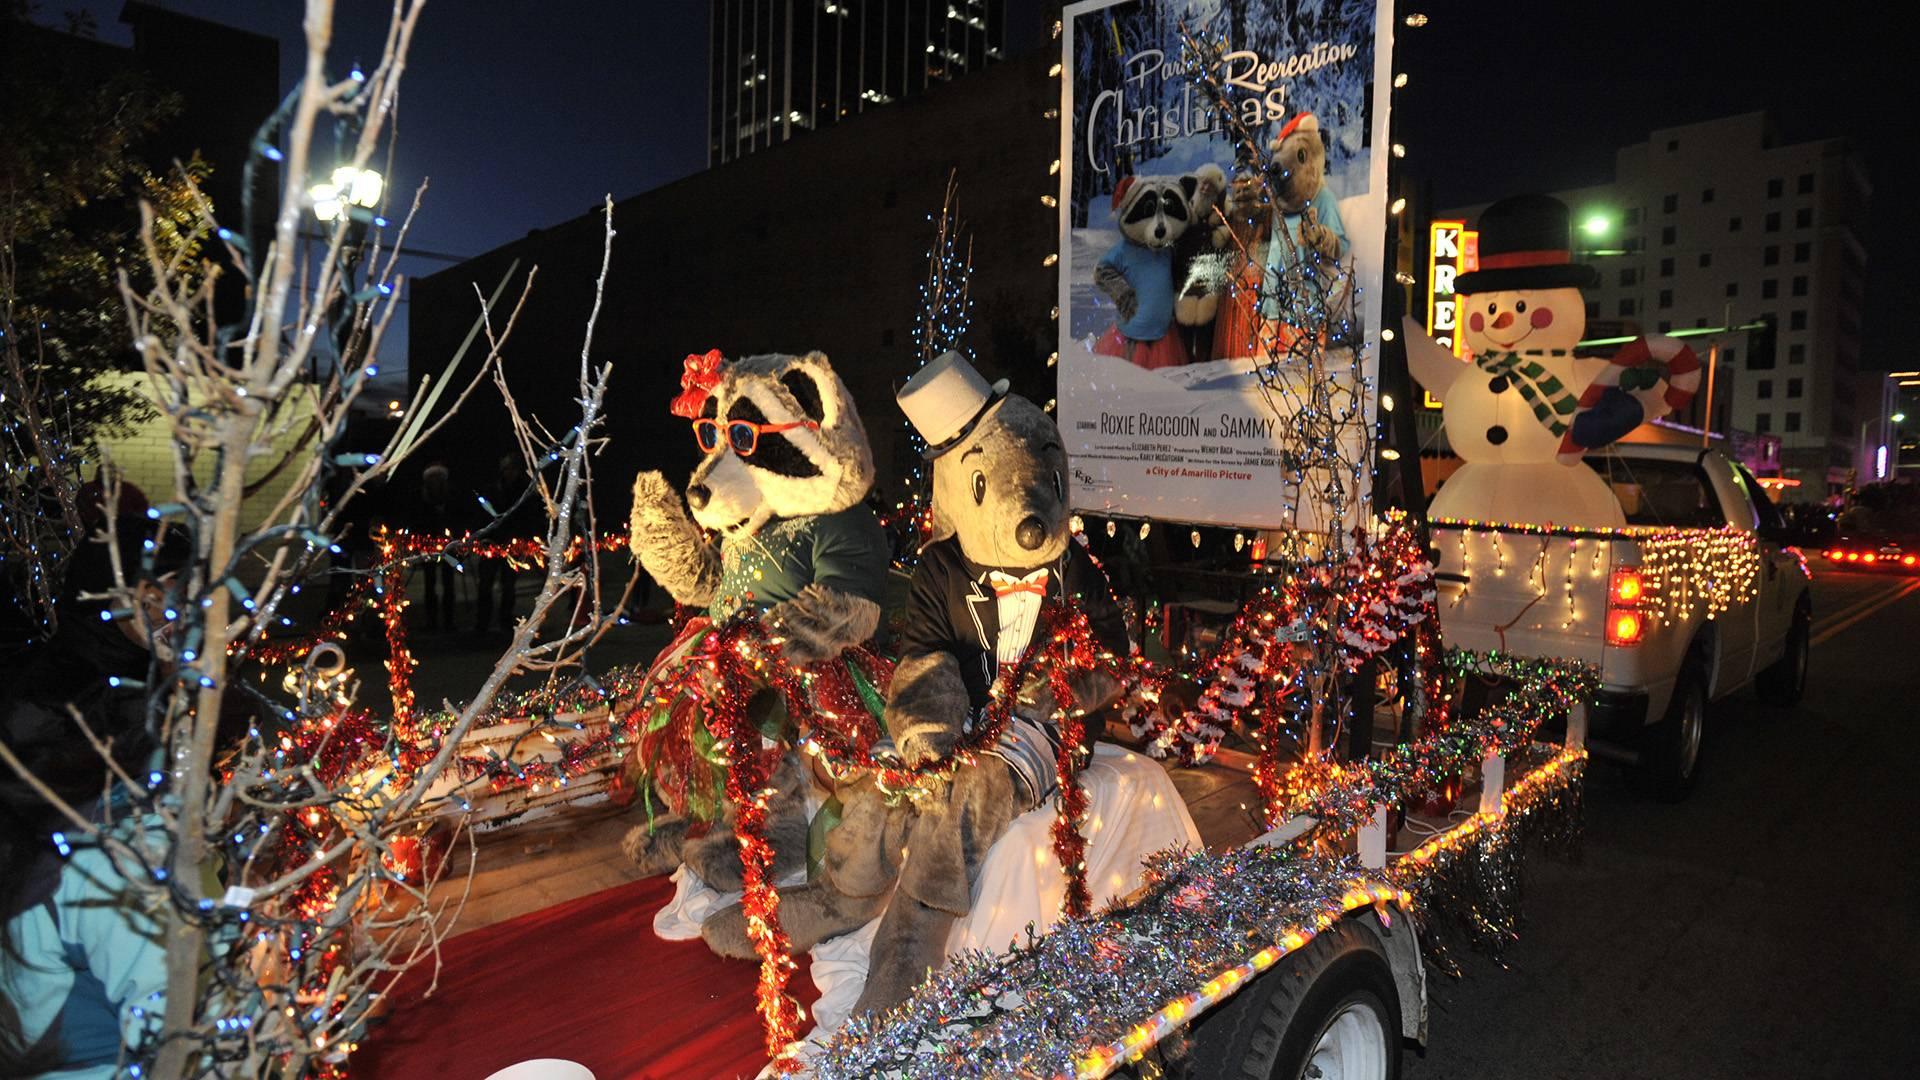 Christmas Roundup: Activities to keep you Ho-Ho-Ho\'ing all season long